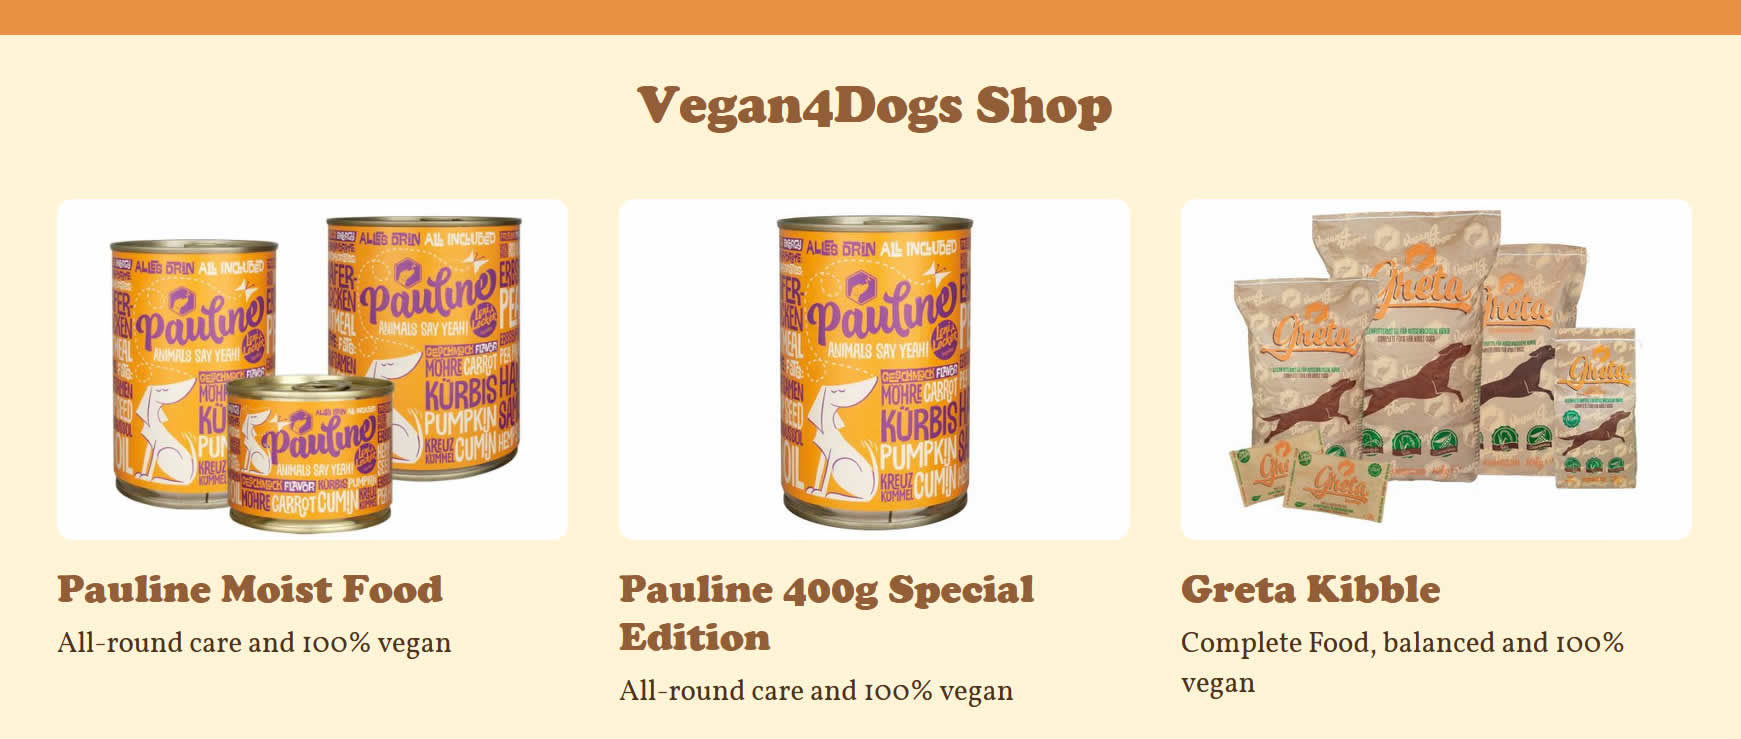 Vegan4Dogs shop